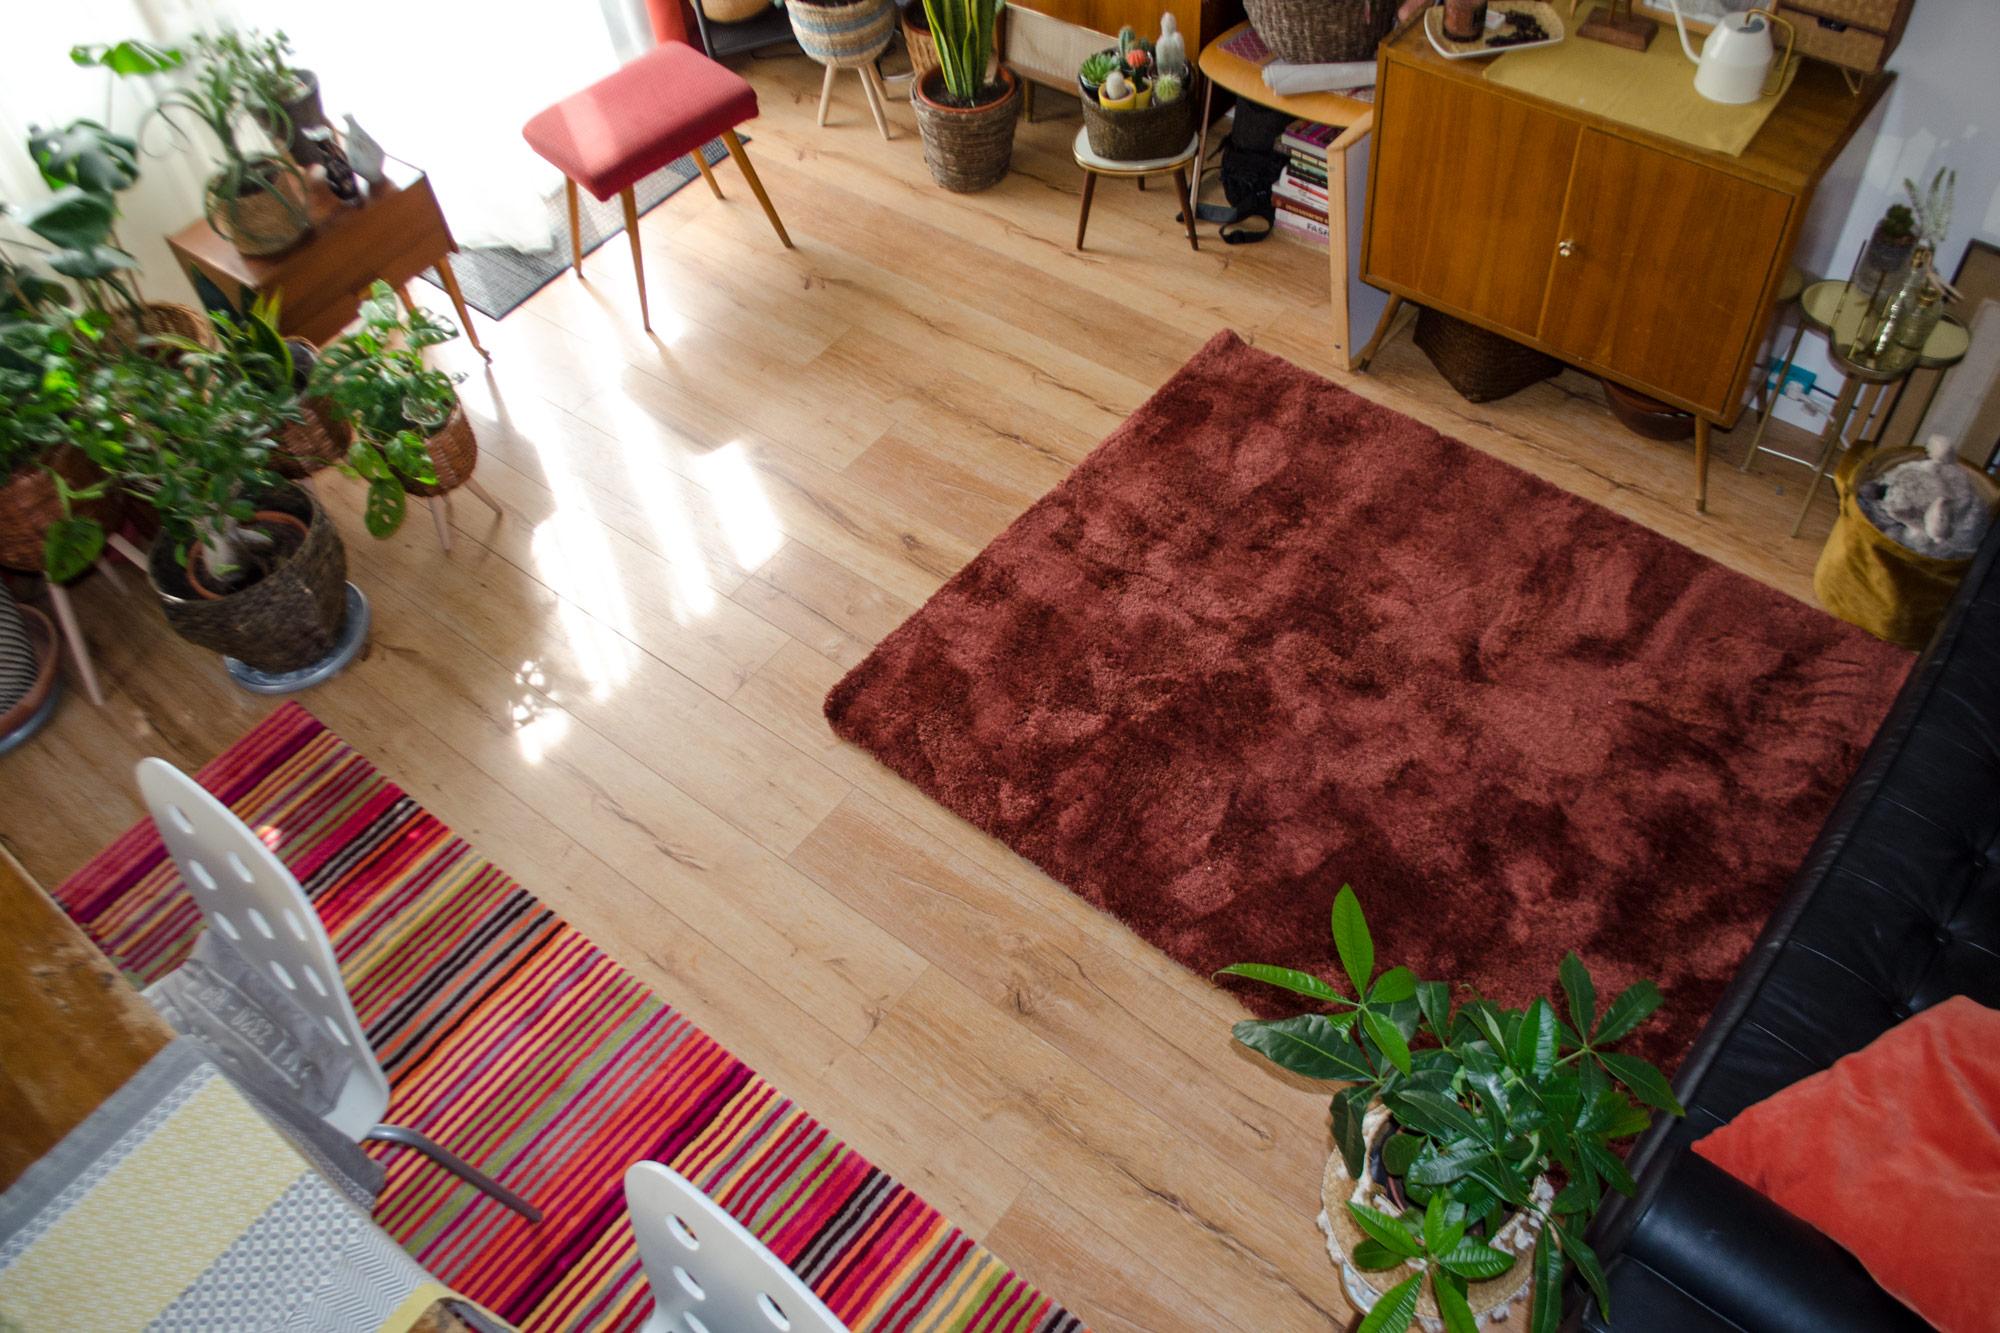 Mid-century Boho Style | Oulet Teppiche für mein WohnzimmerMid-century Boho Style | Oulet Teppiche für mein Wohnzimmer